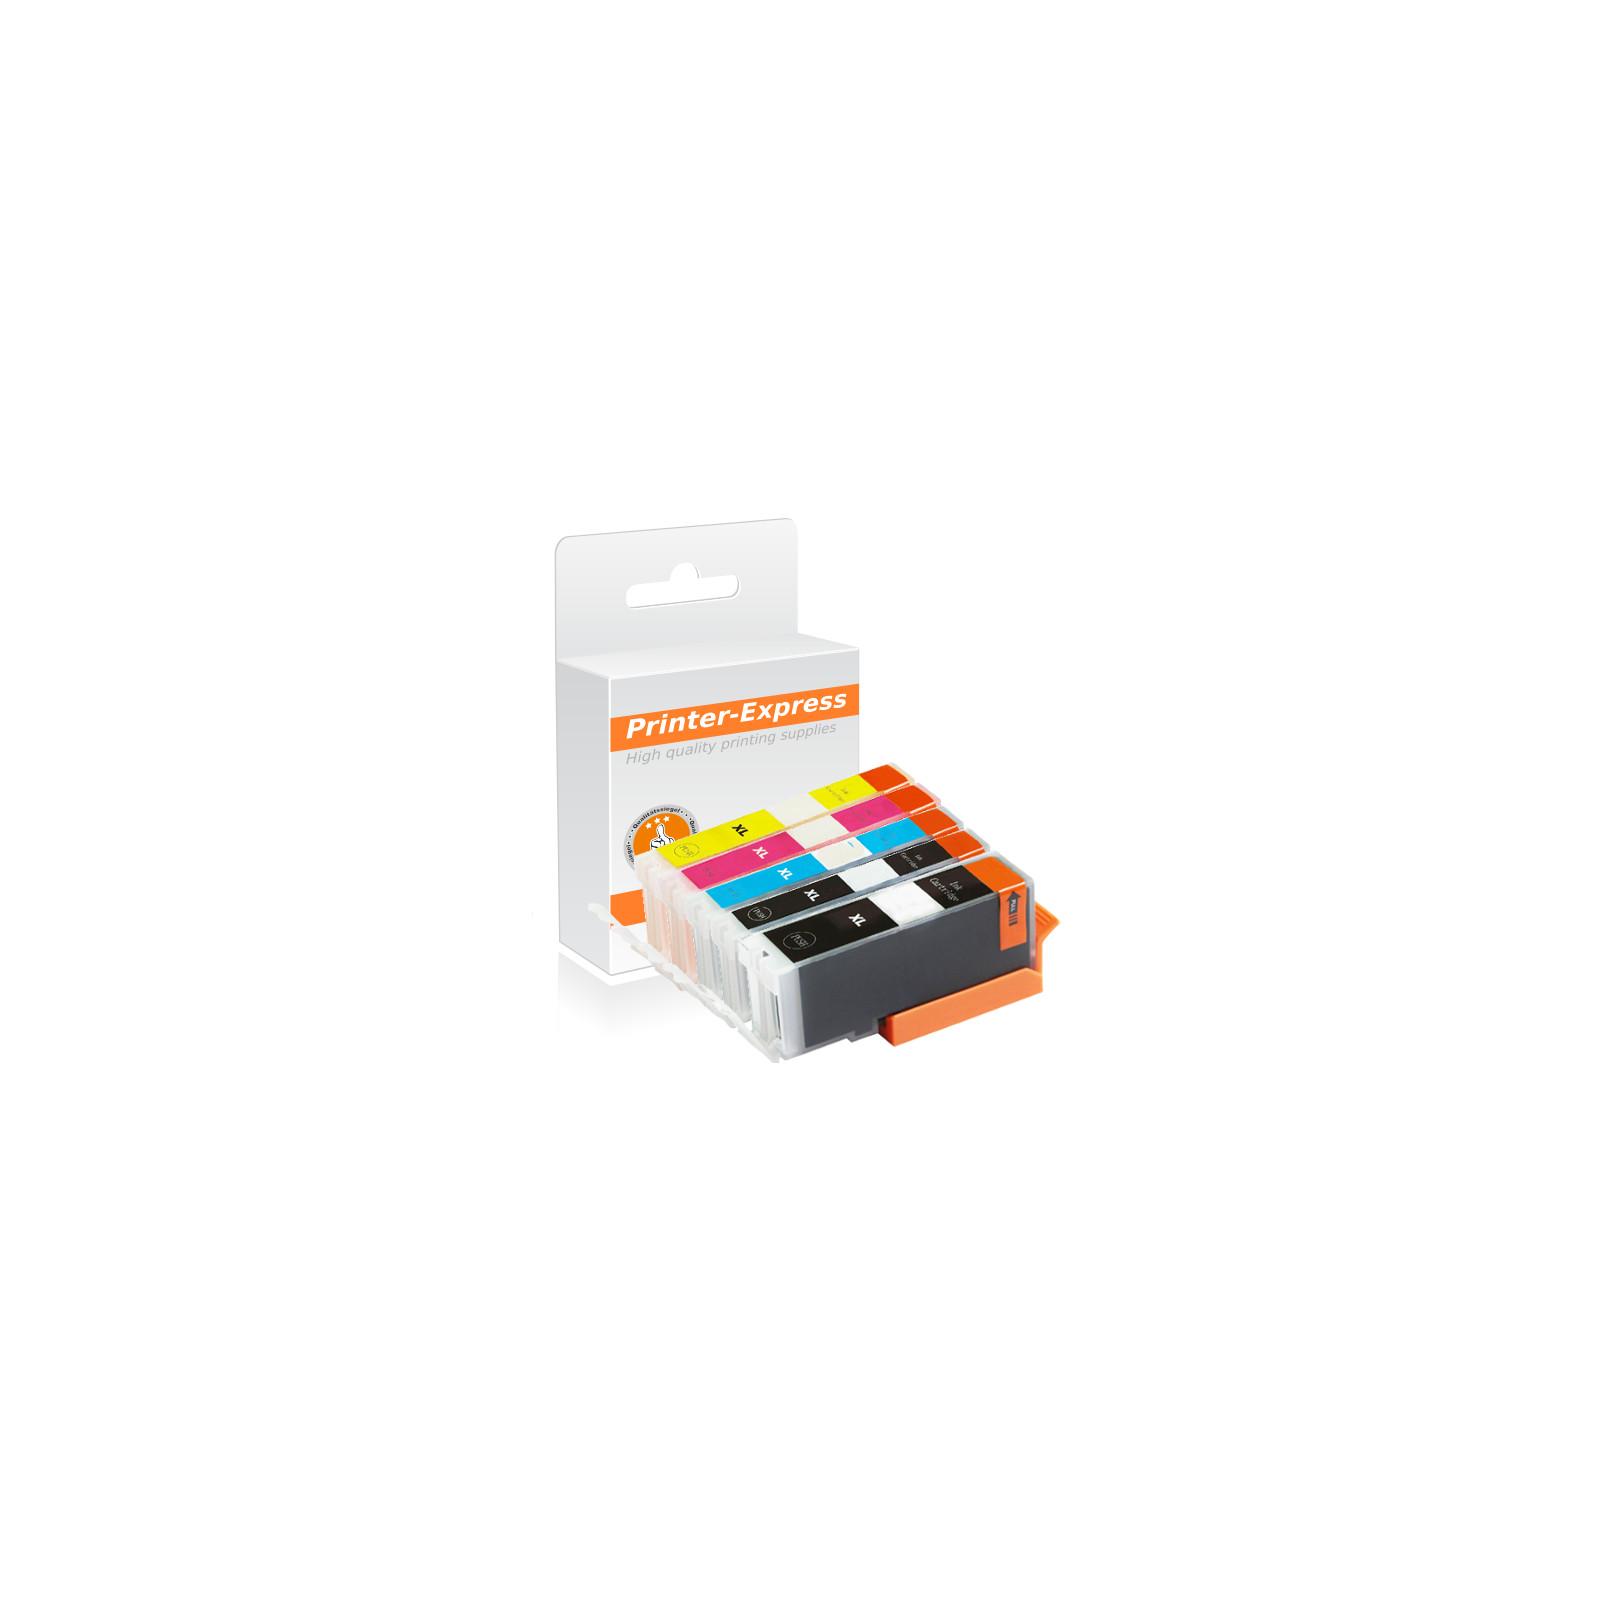 patronen 5er set ersetzt canon pgi 580 cli 581 xxl printer express 59 85. Black Bedroom Furniture Sets. Home Design Ideas